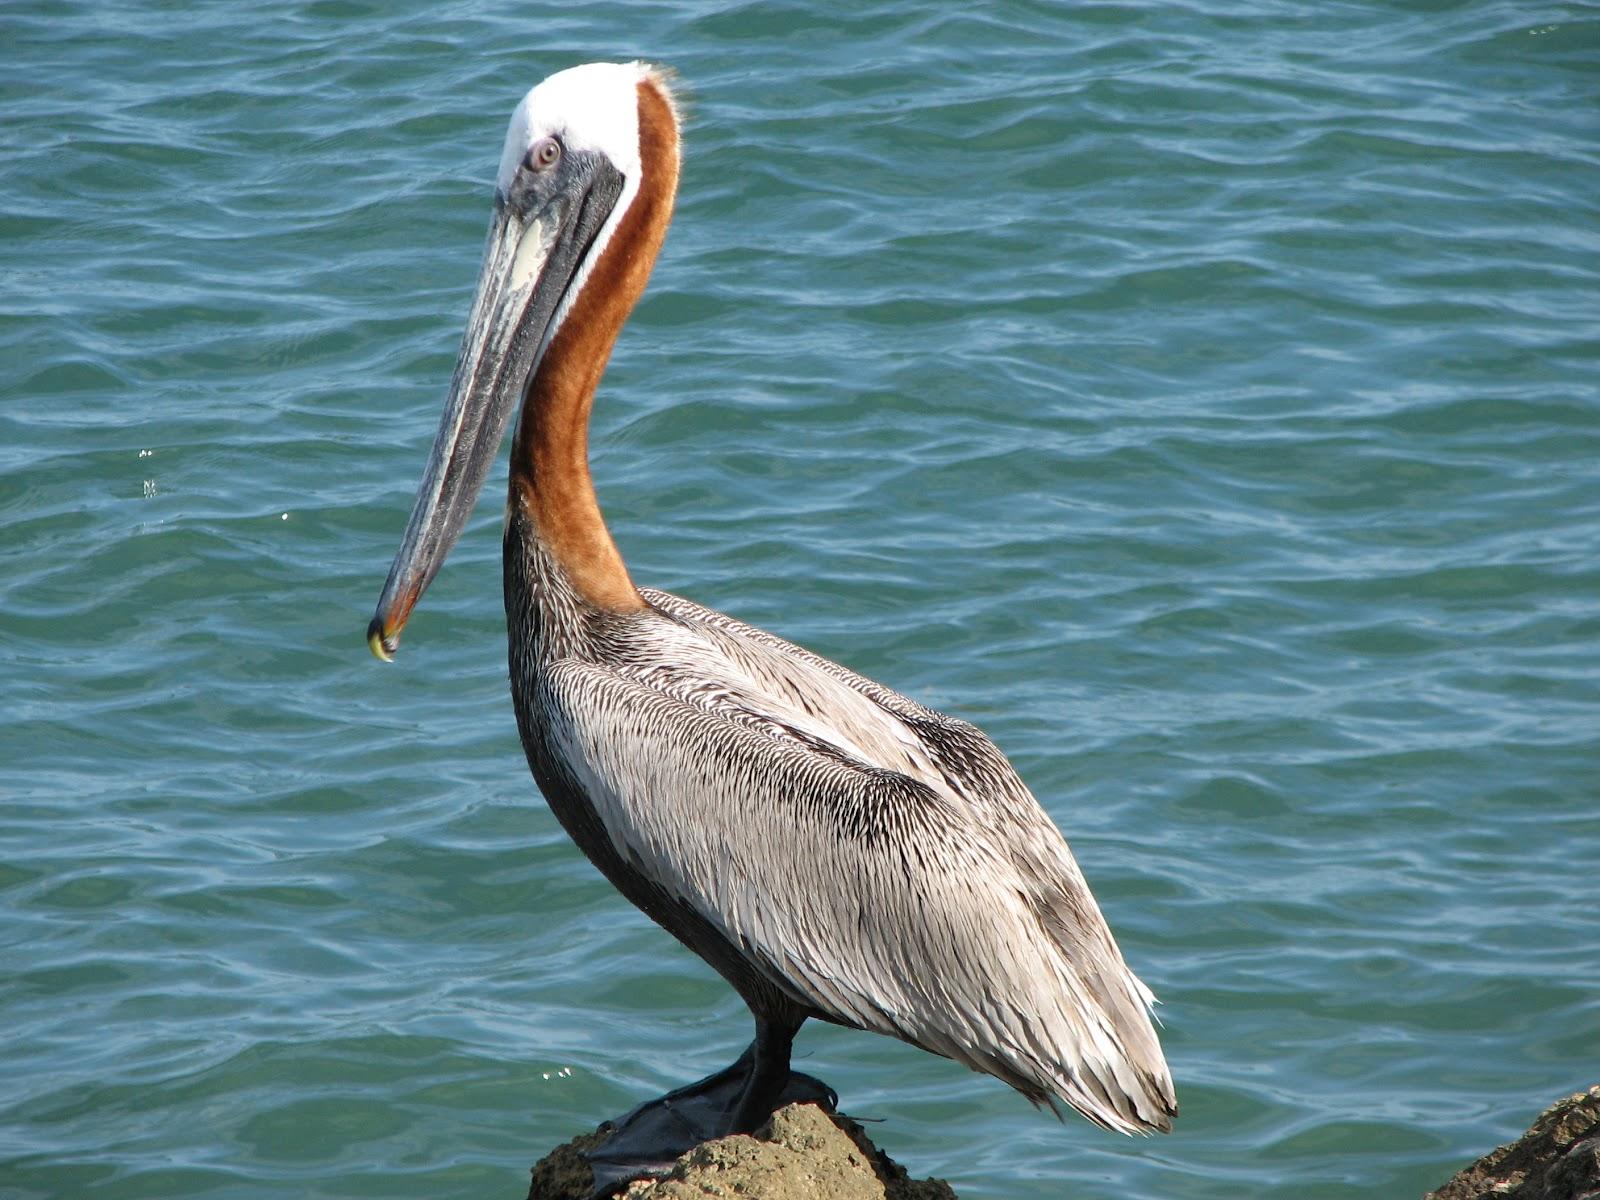 Bonao internacional esculturas de pelicanos frente a - Fotos de pelicanos ...